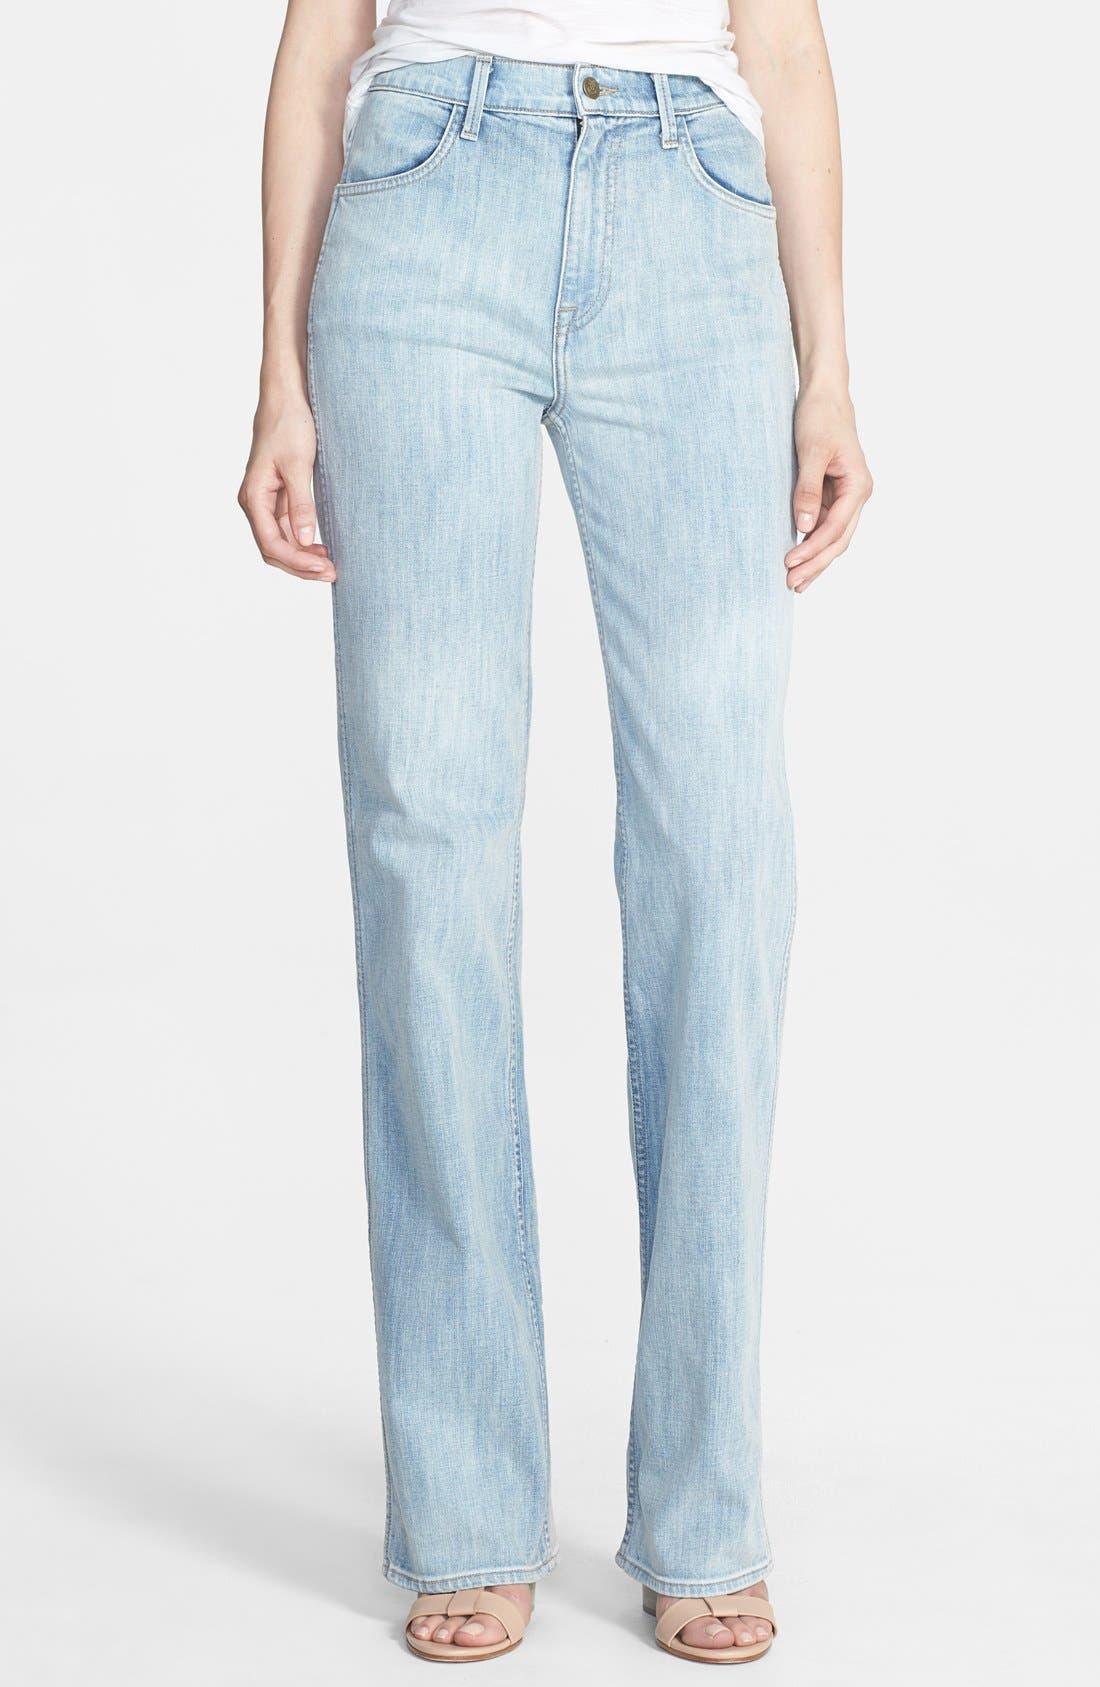 Alternate Image 1 Selected - Wildfox 'Luca' High Rise Straight Leg Jeans (Faithful)